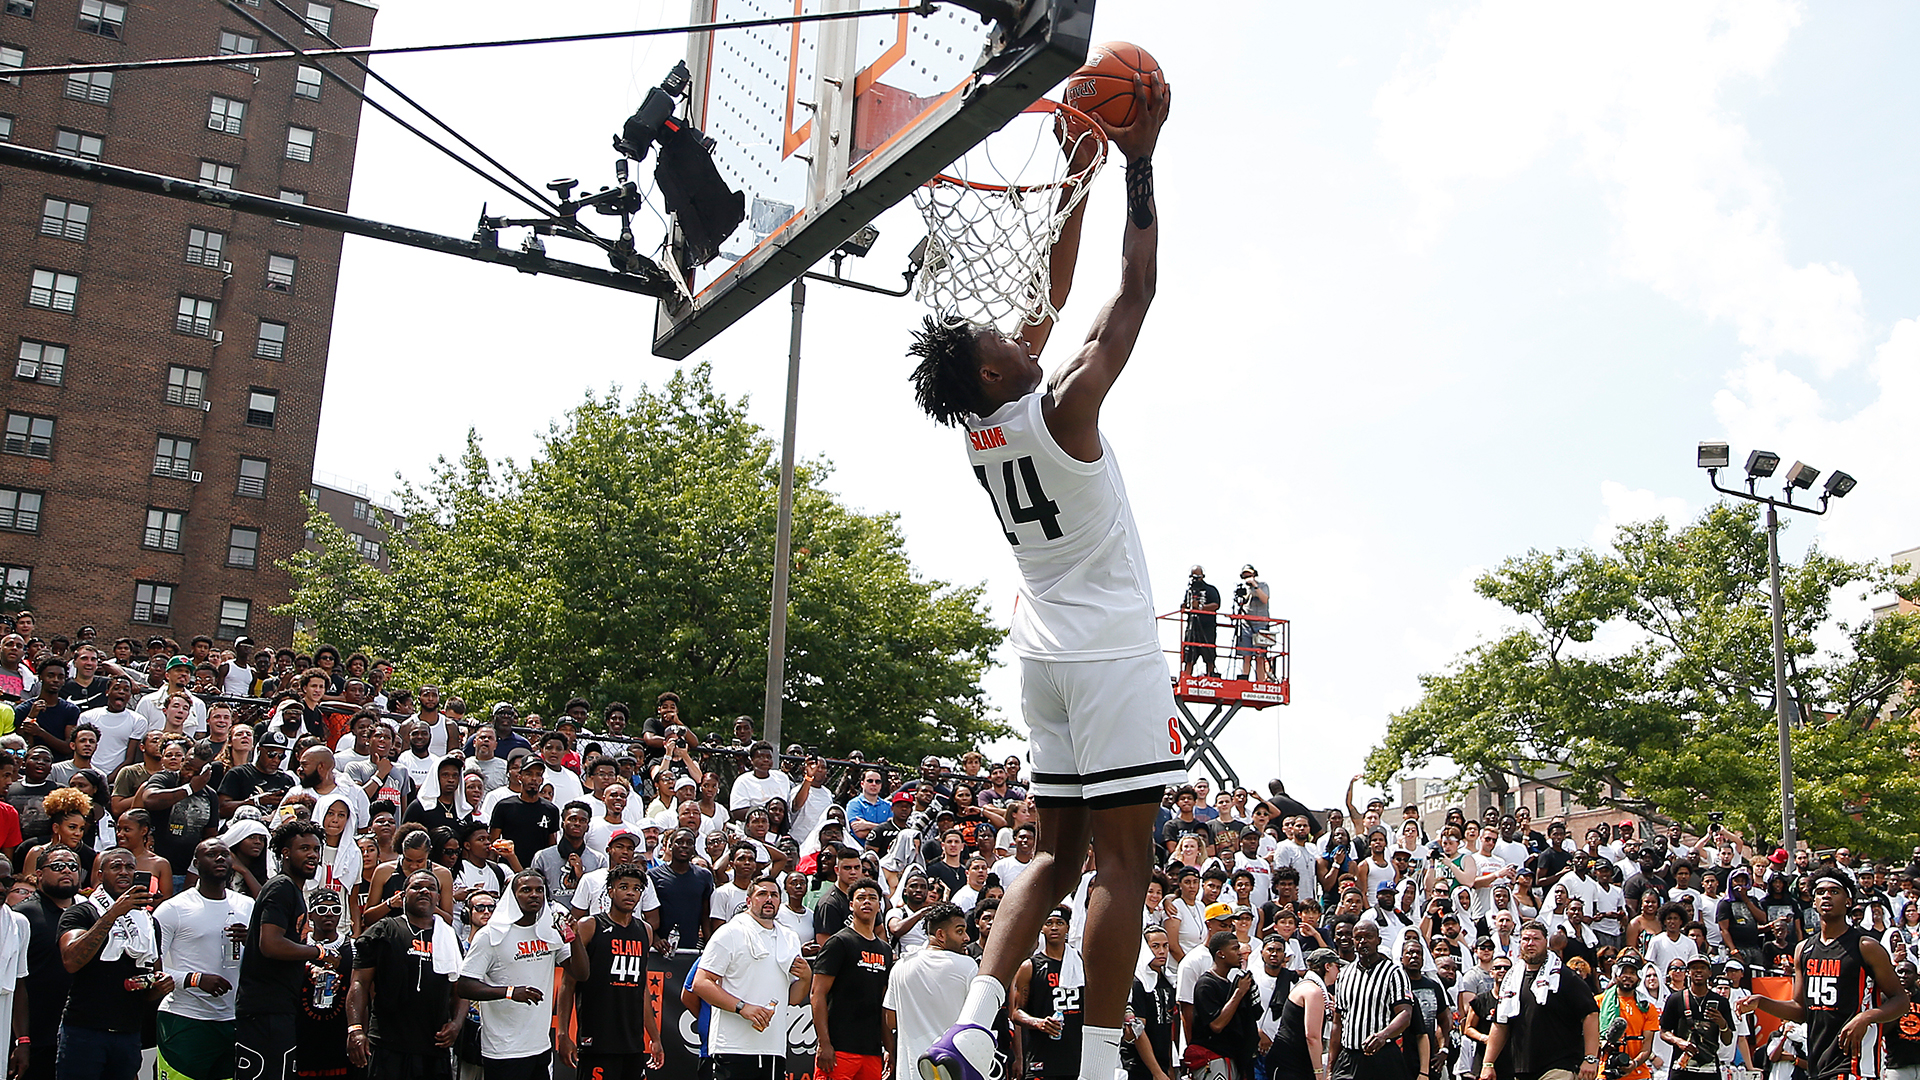 Jonathan Kuminga joining 2021 NBA Draft class is great for Warriors